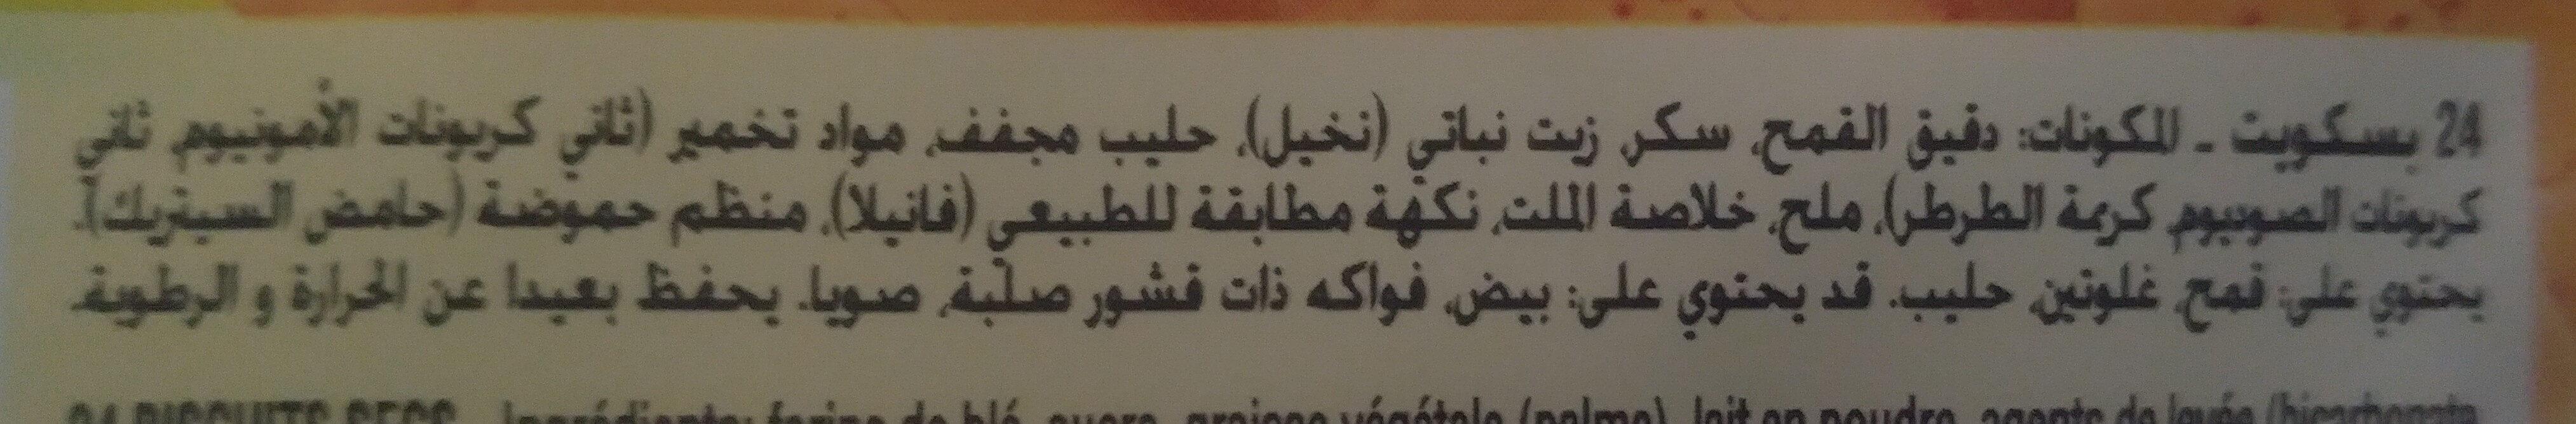 Biscuits Saida - المكونات - ar